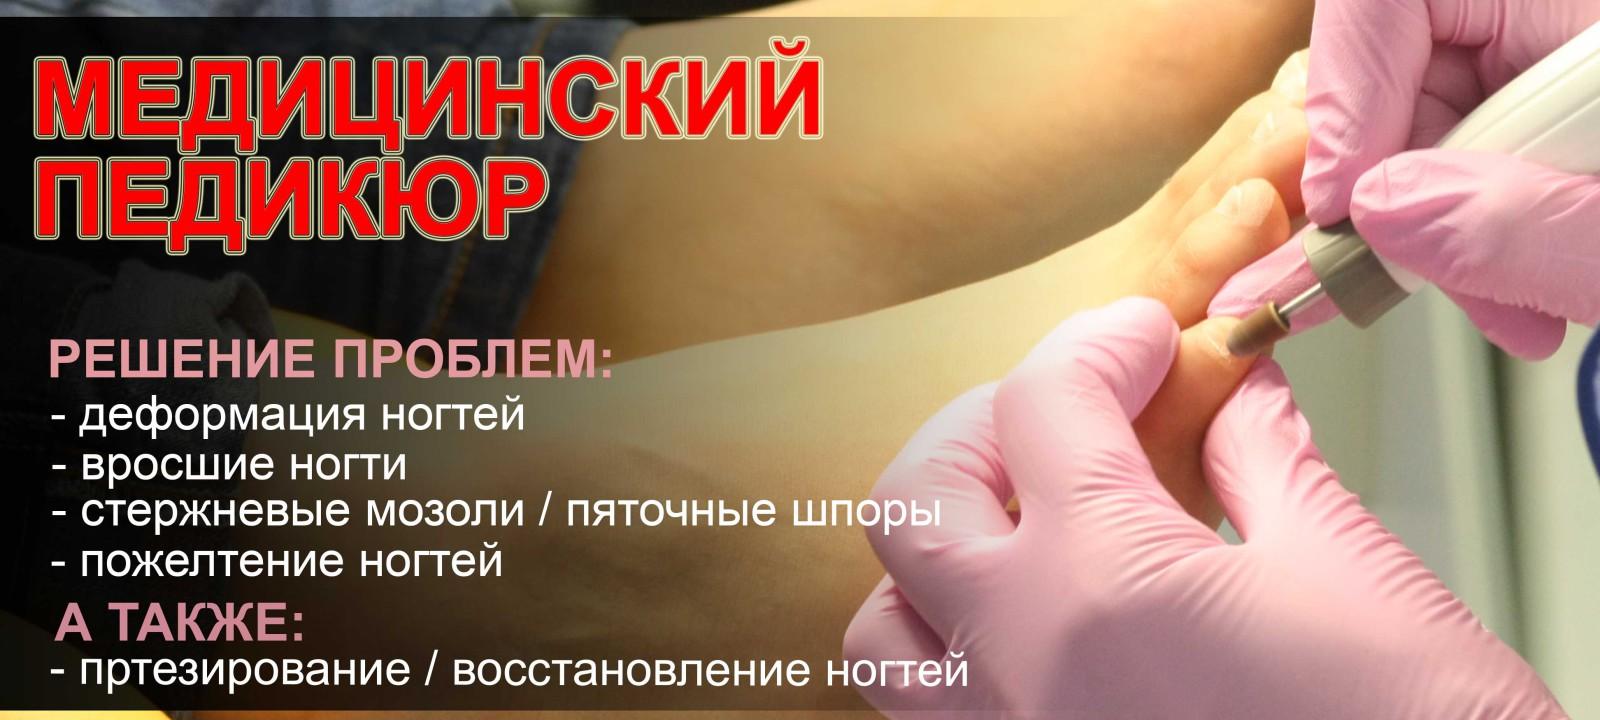 Банер_медицинский-педикюр